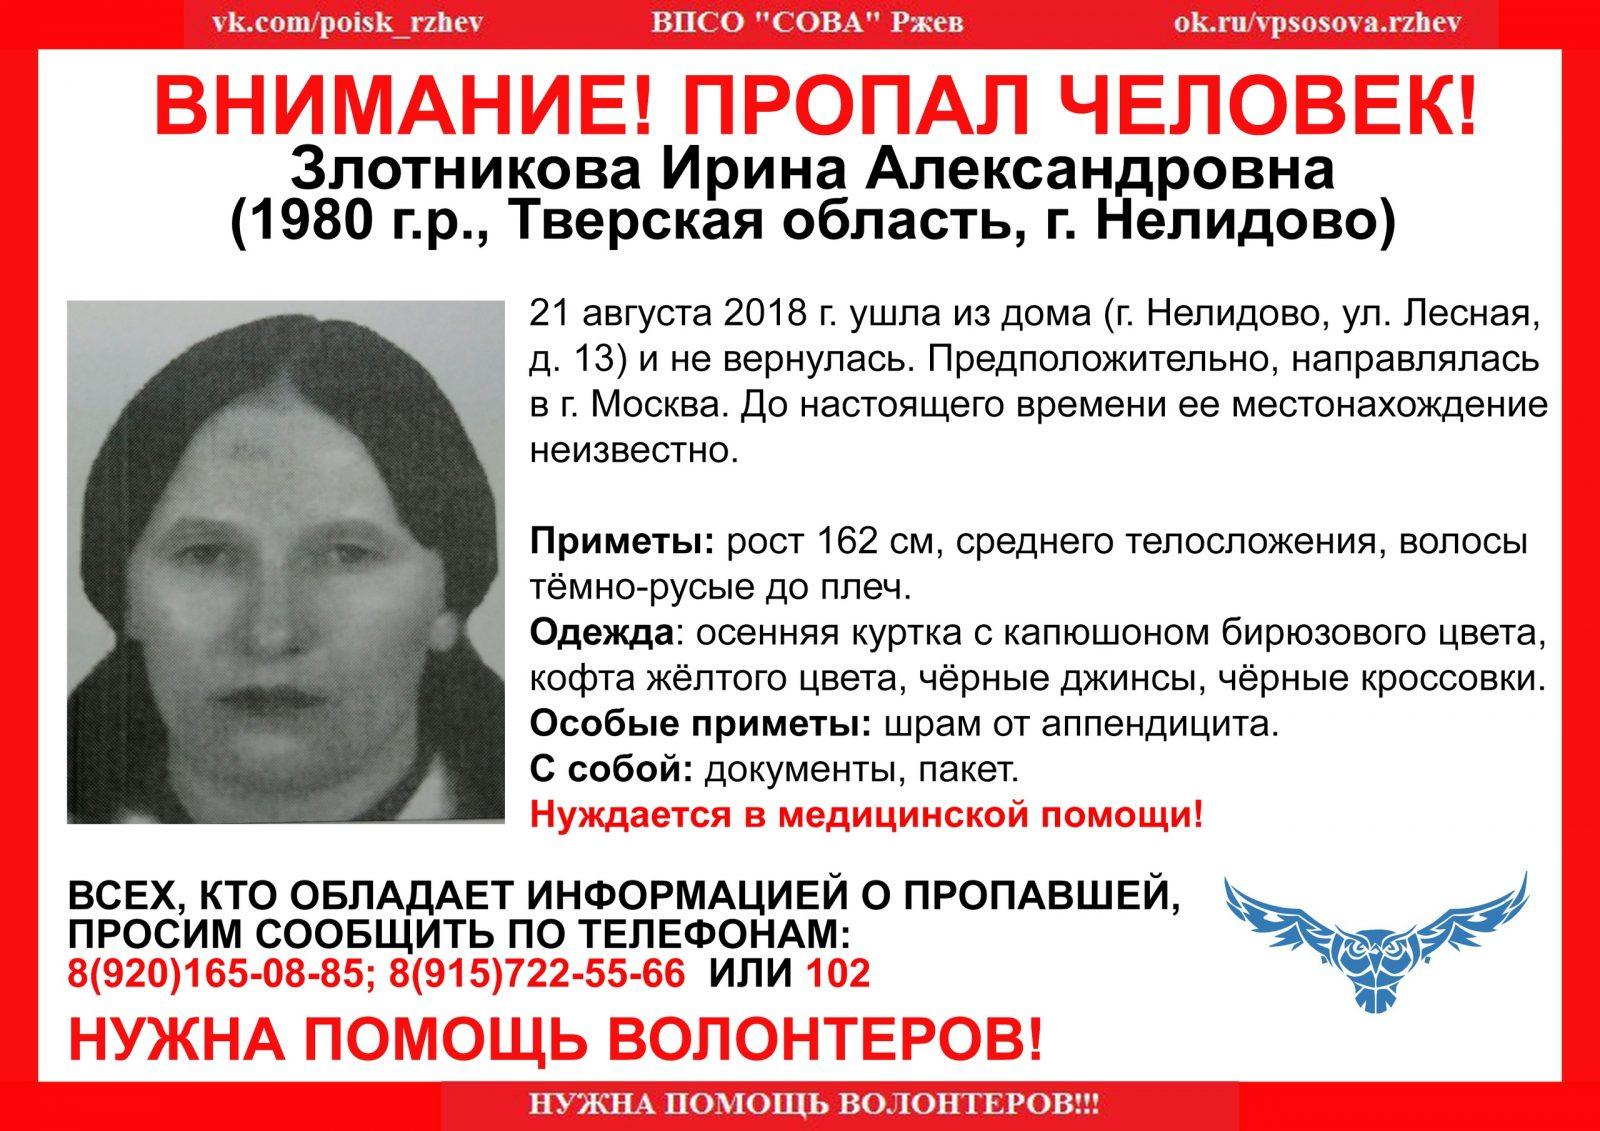 Пропала Злотникова Ирина Александровна (1980 г.р.)